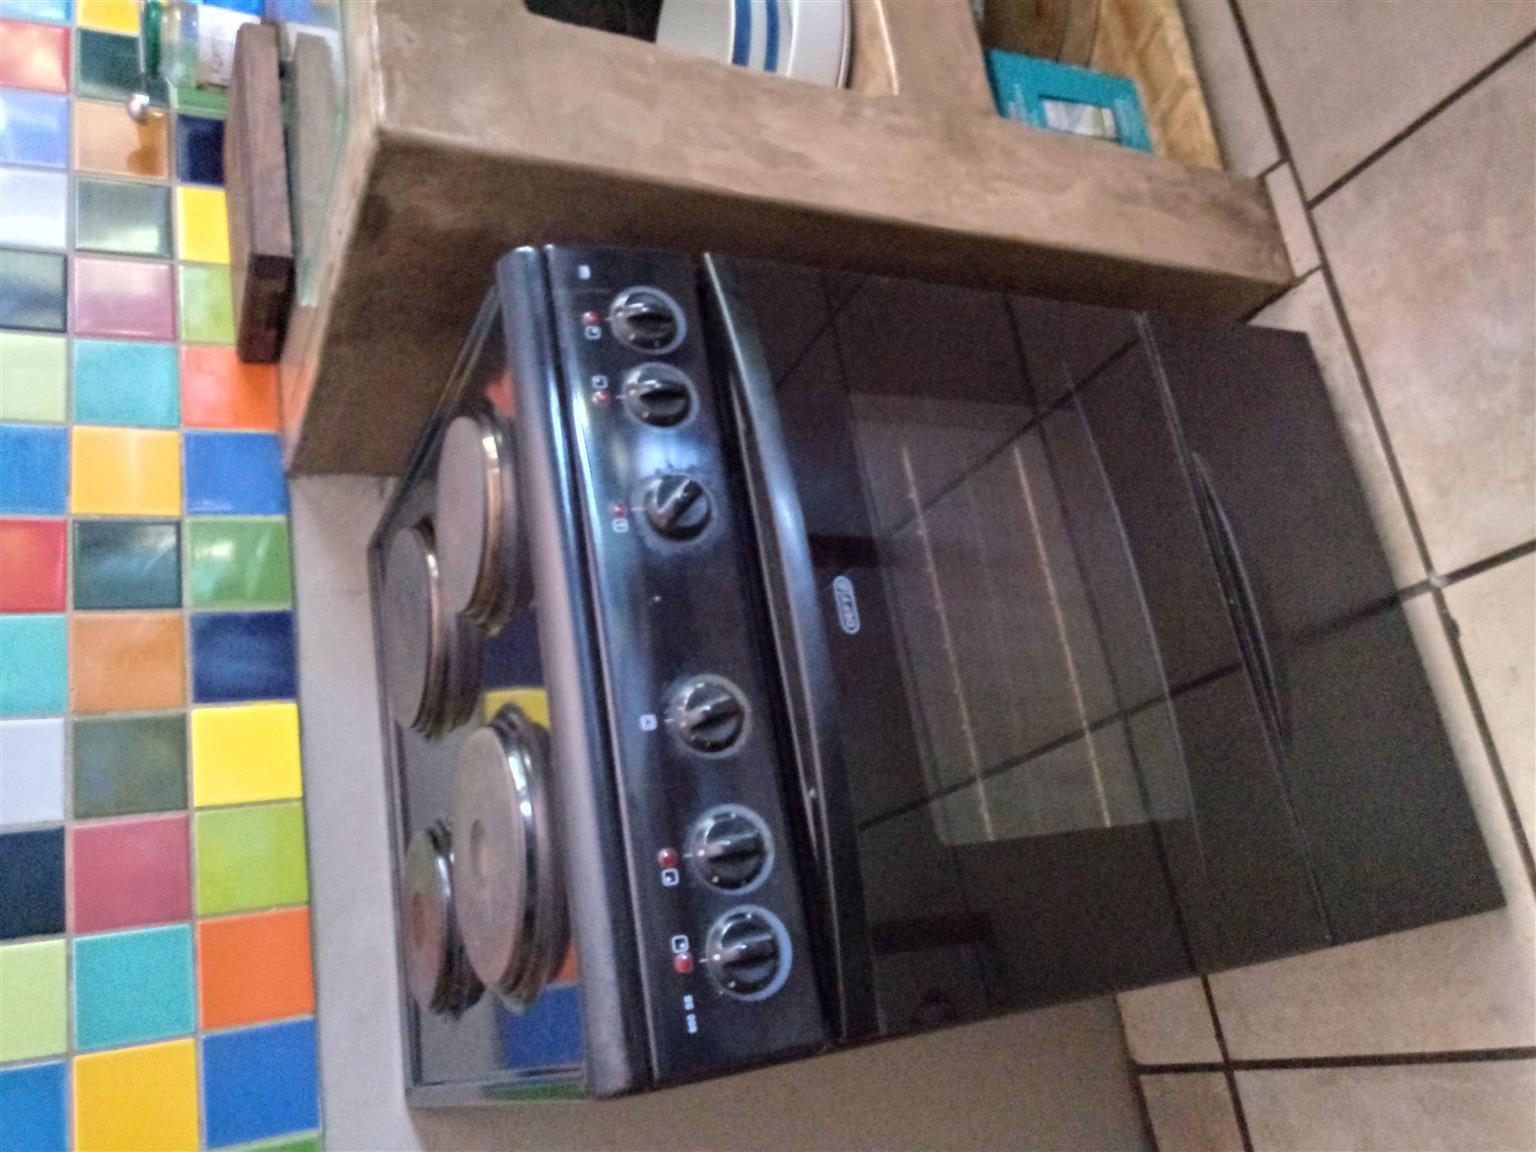 Defy 600 SB Oven